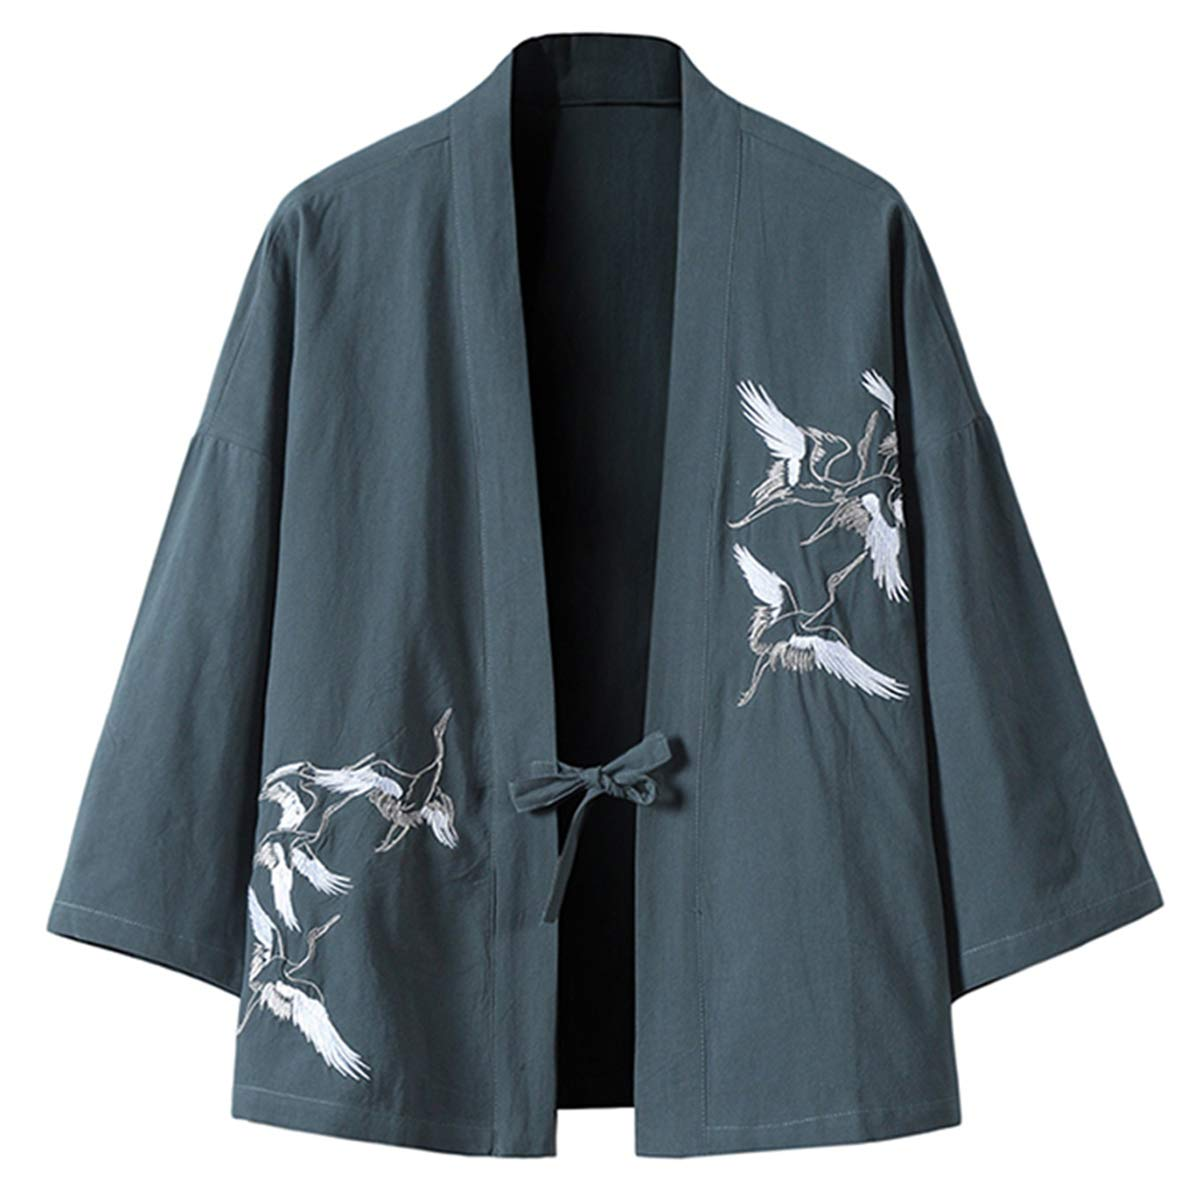 PRIJOUHE Men's Japanese Kimono Jacket Cardigan Yukata Noragi Casual Fashion Seven Sleeves Lightweight Open Front Coat by PRIJOUHE